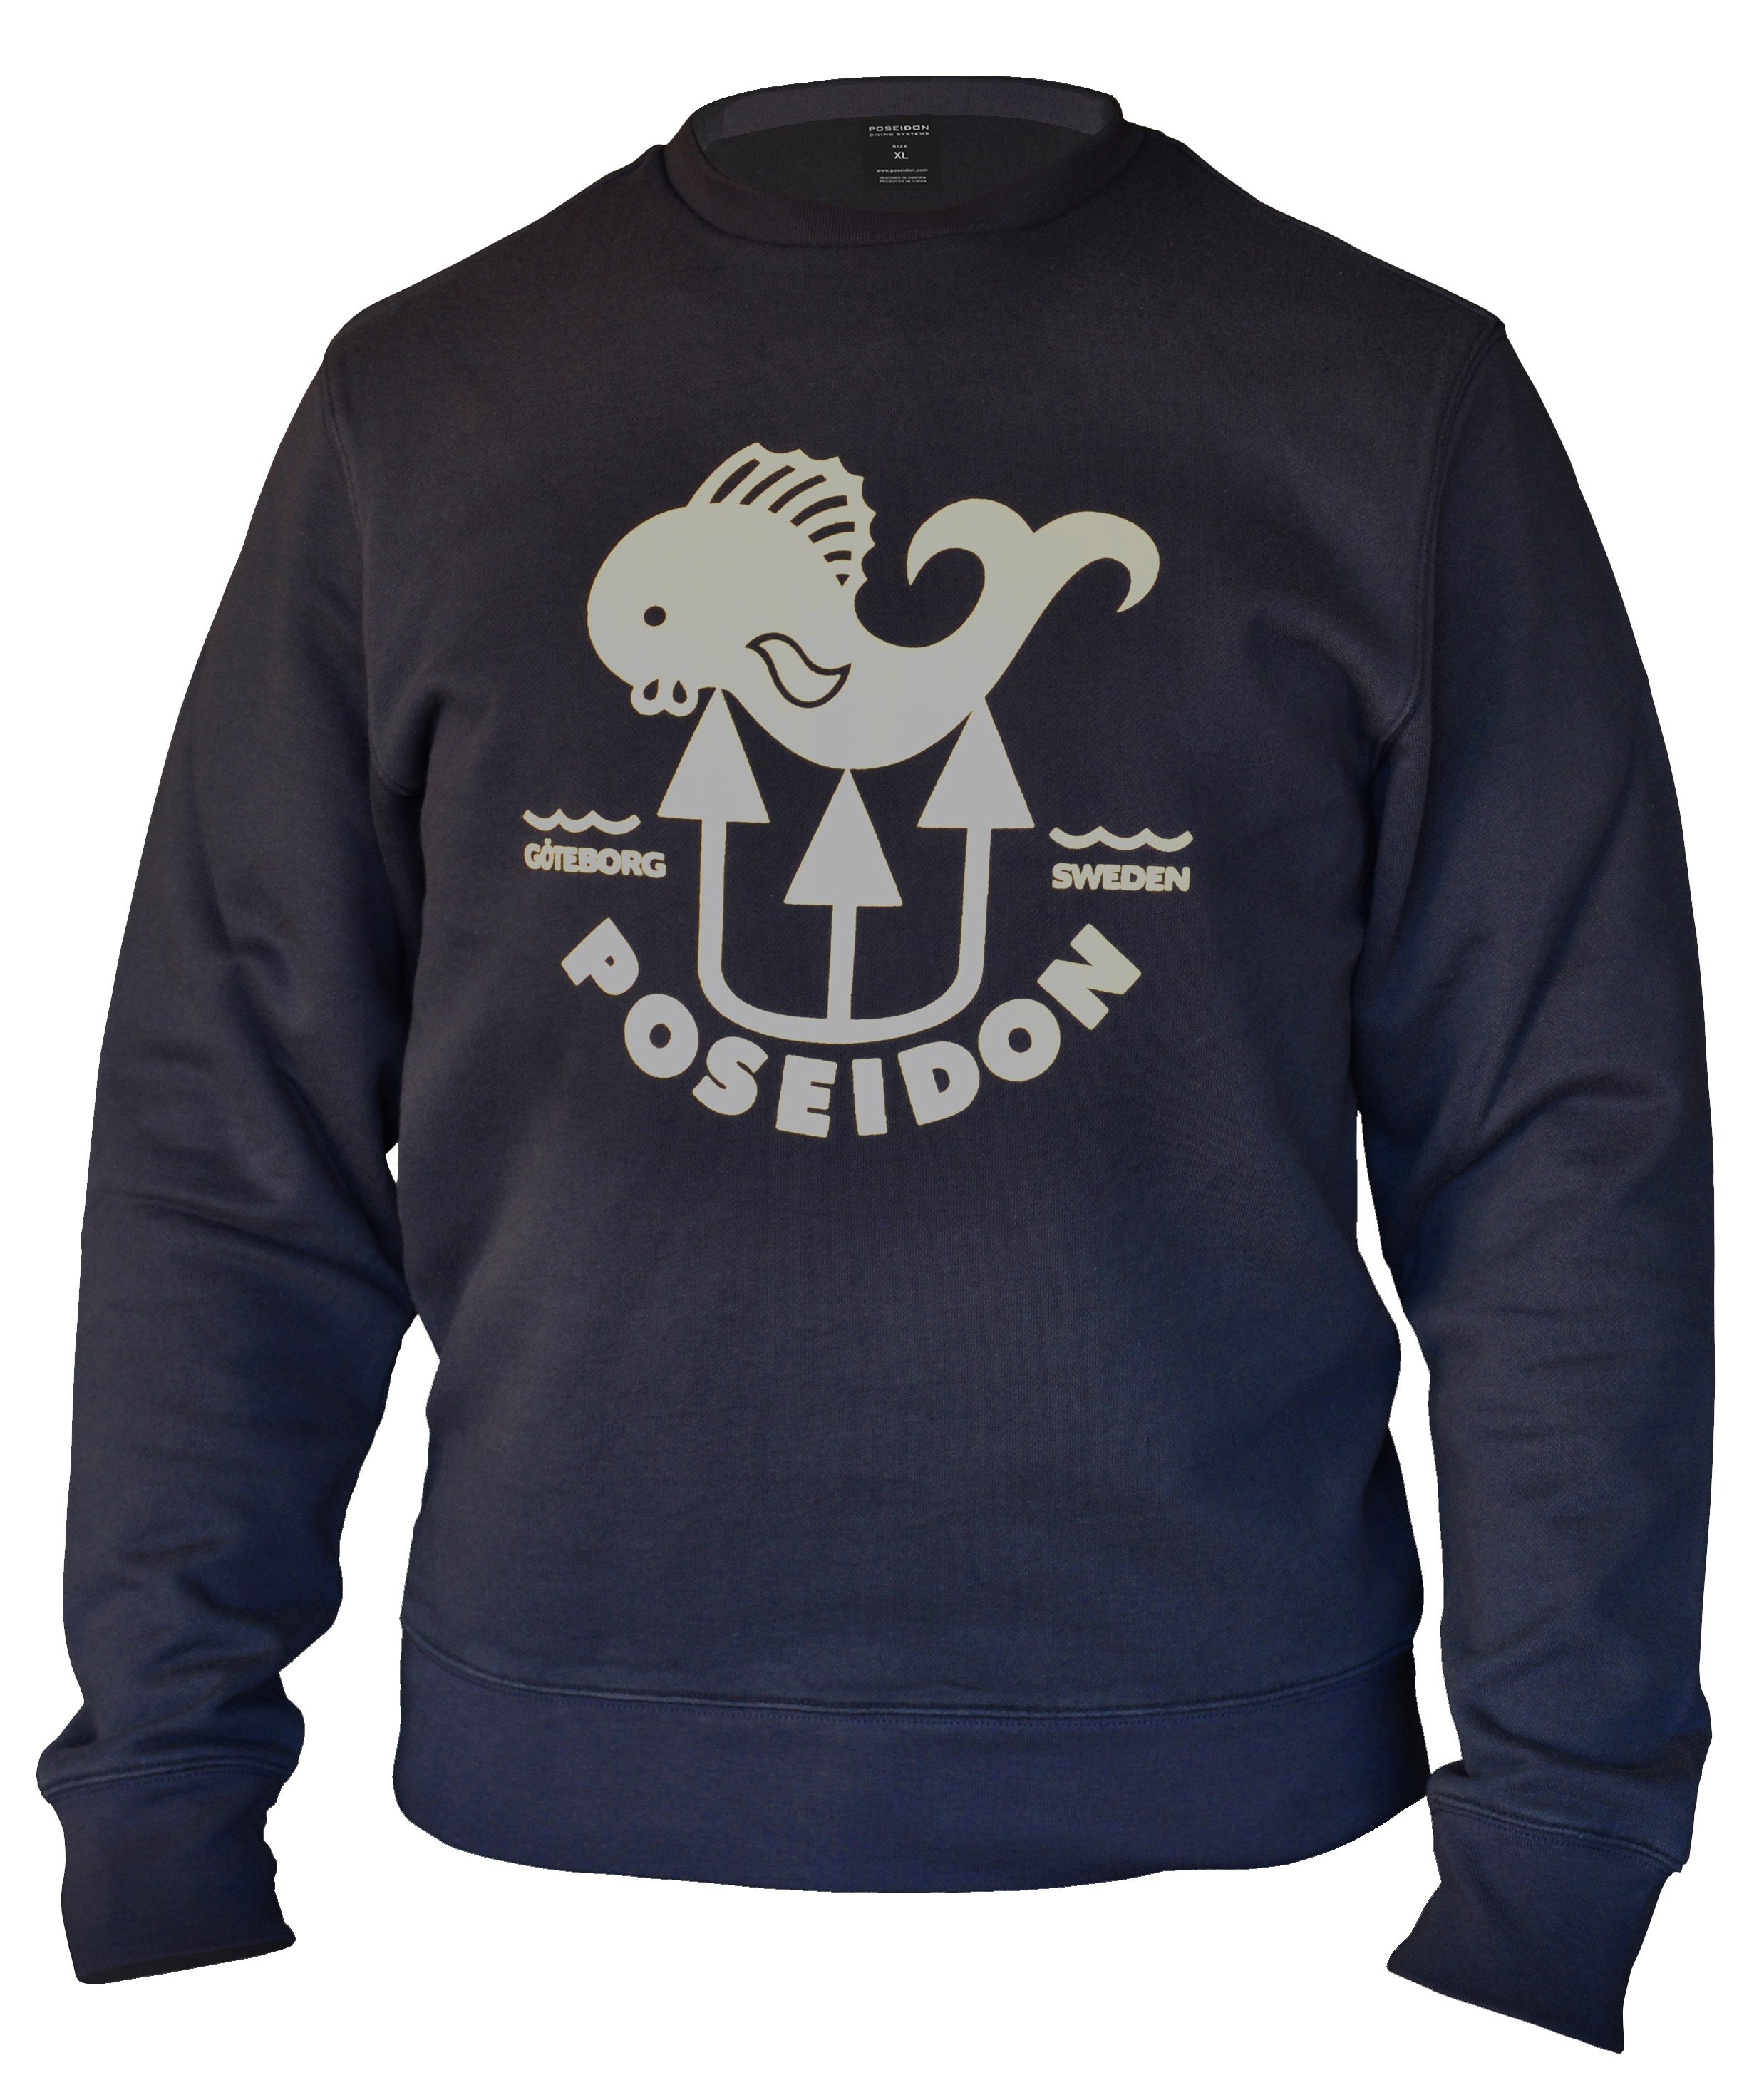 Poseidon Fish Sweatshirt